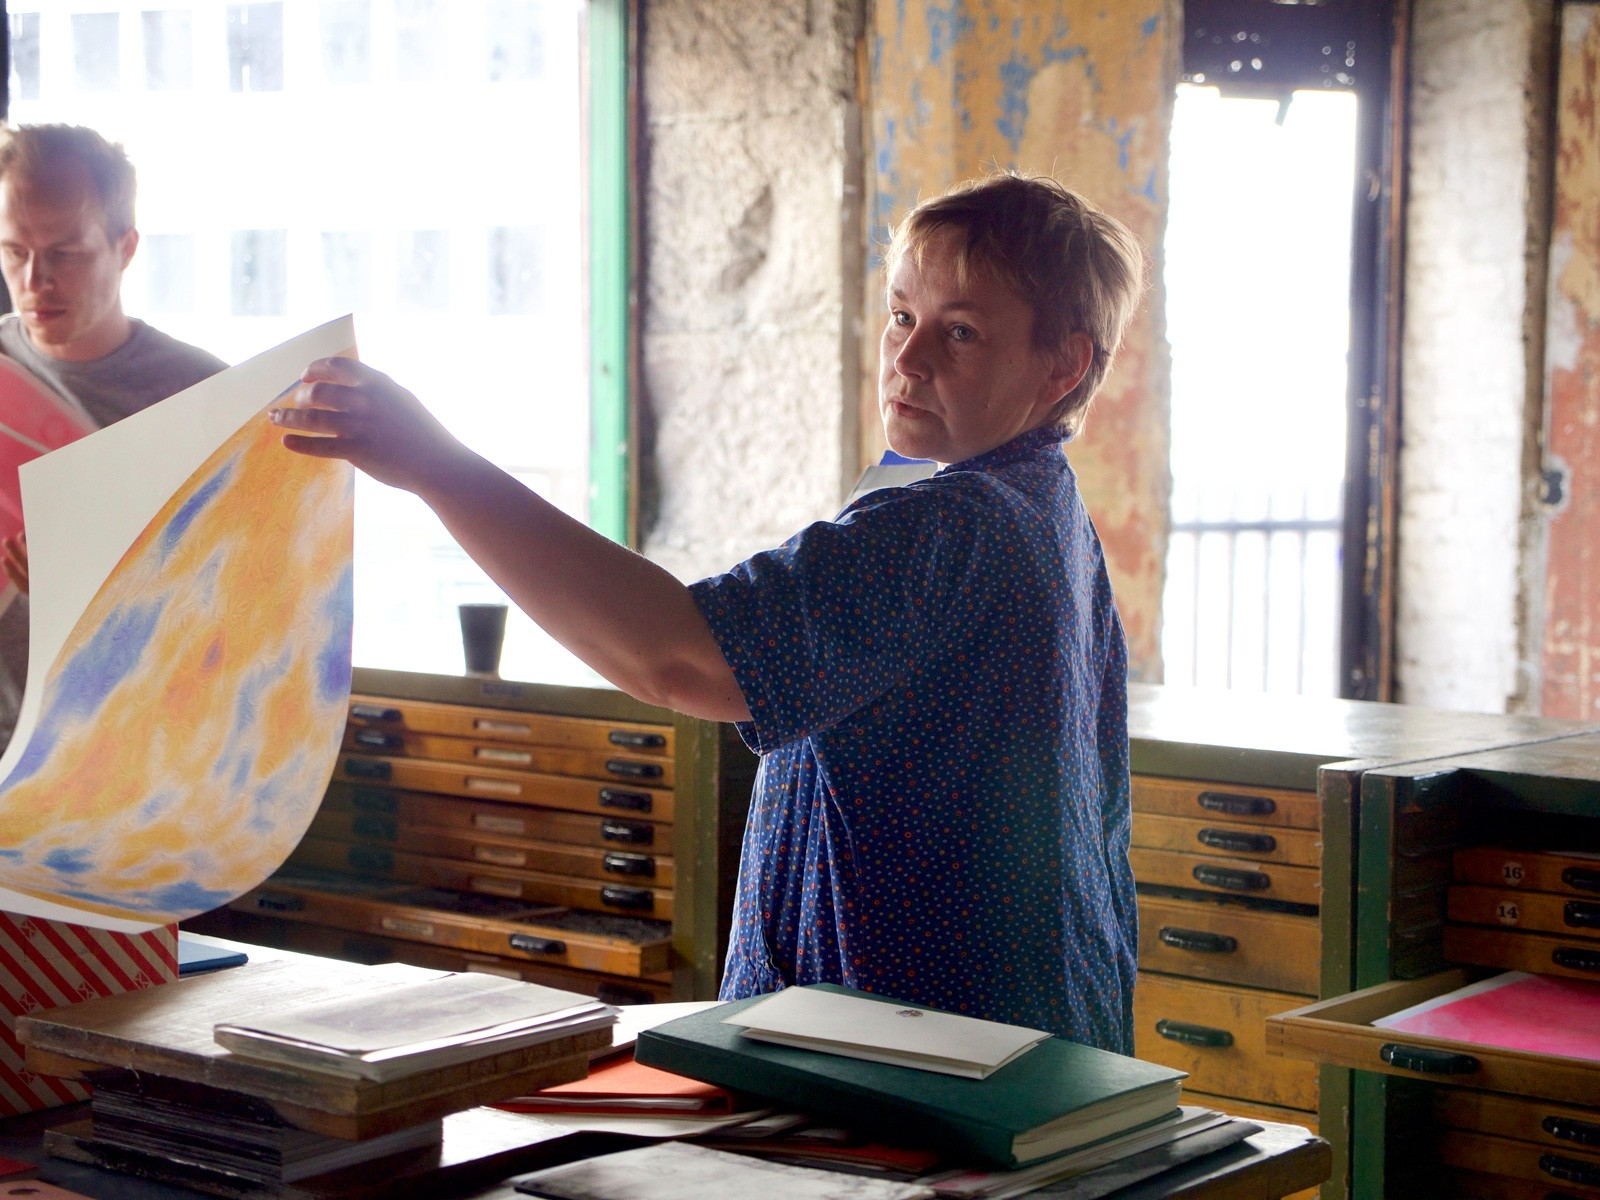 Louise Sidenius - Hands on Craft - Officin, Hawaii Bio, København